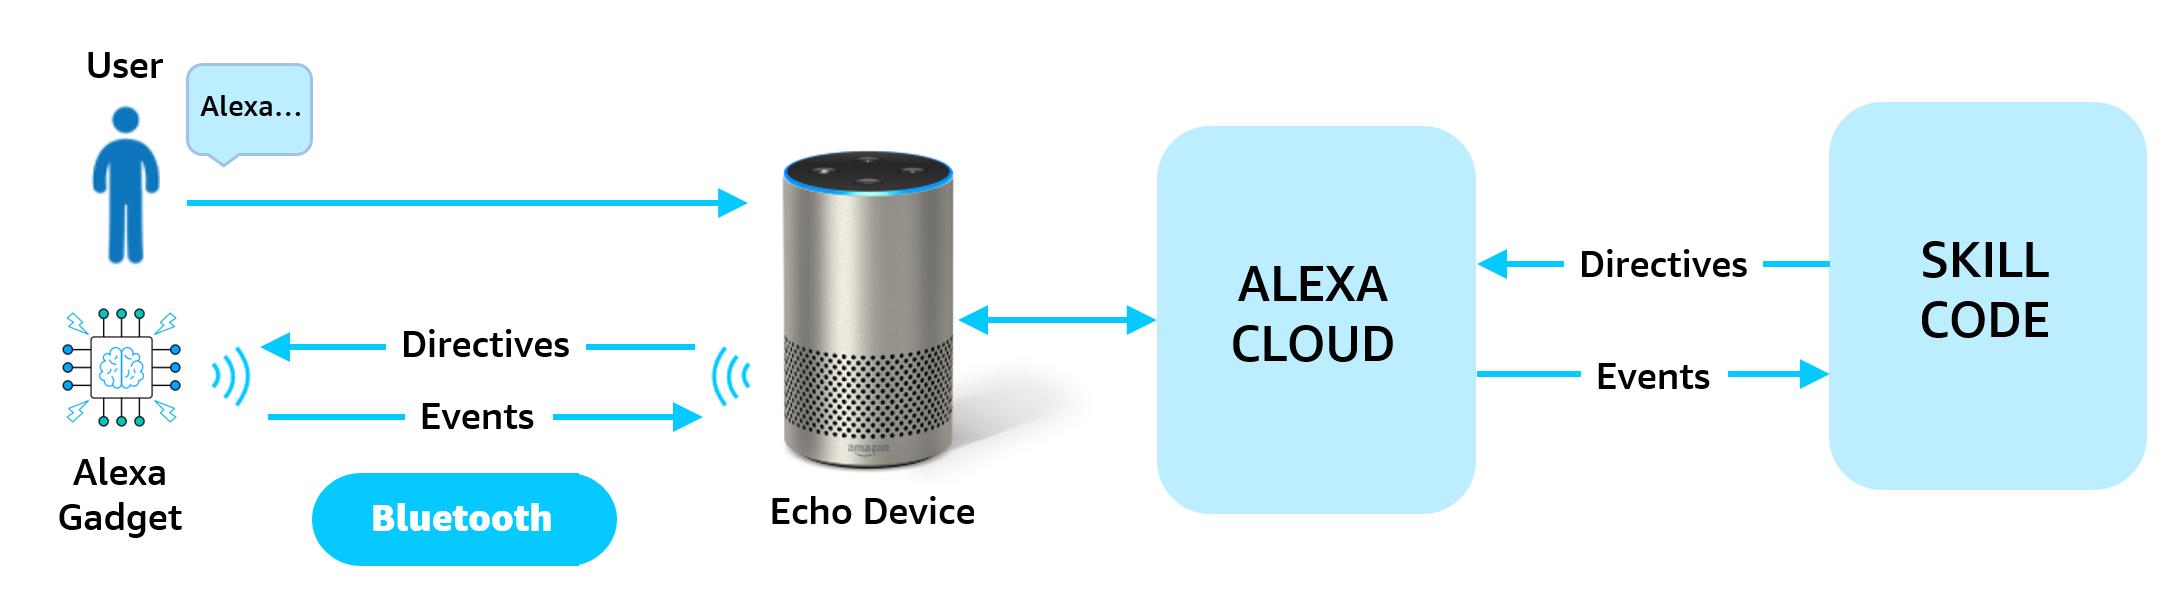 Alexa Gadgets Overview